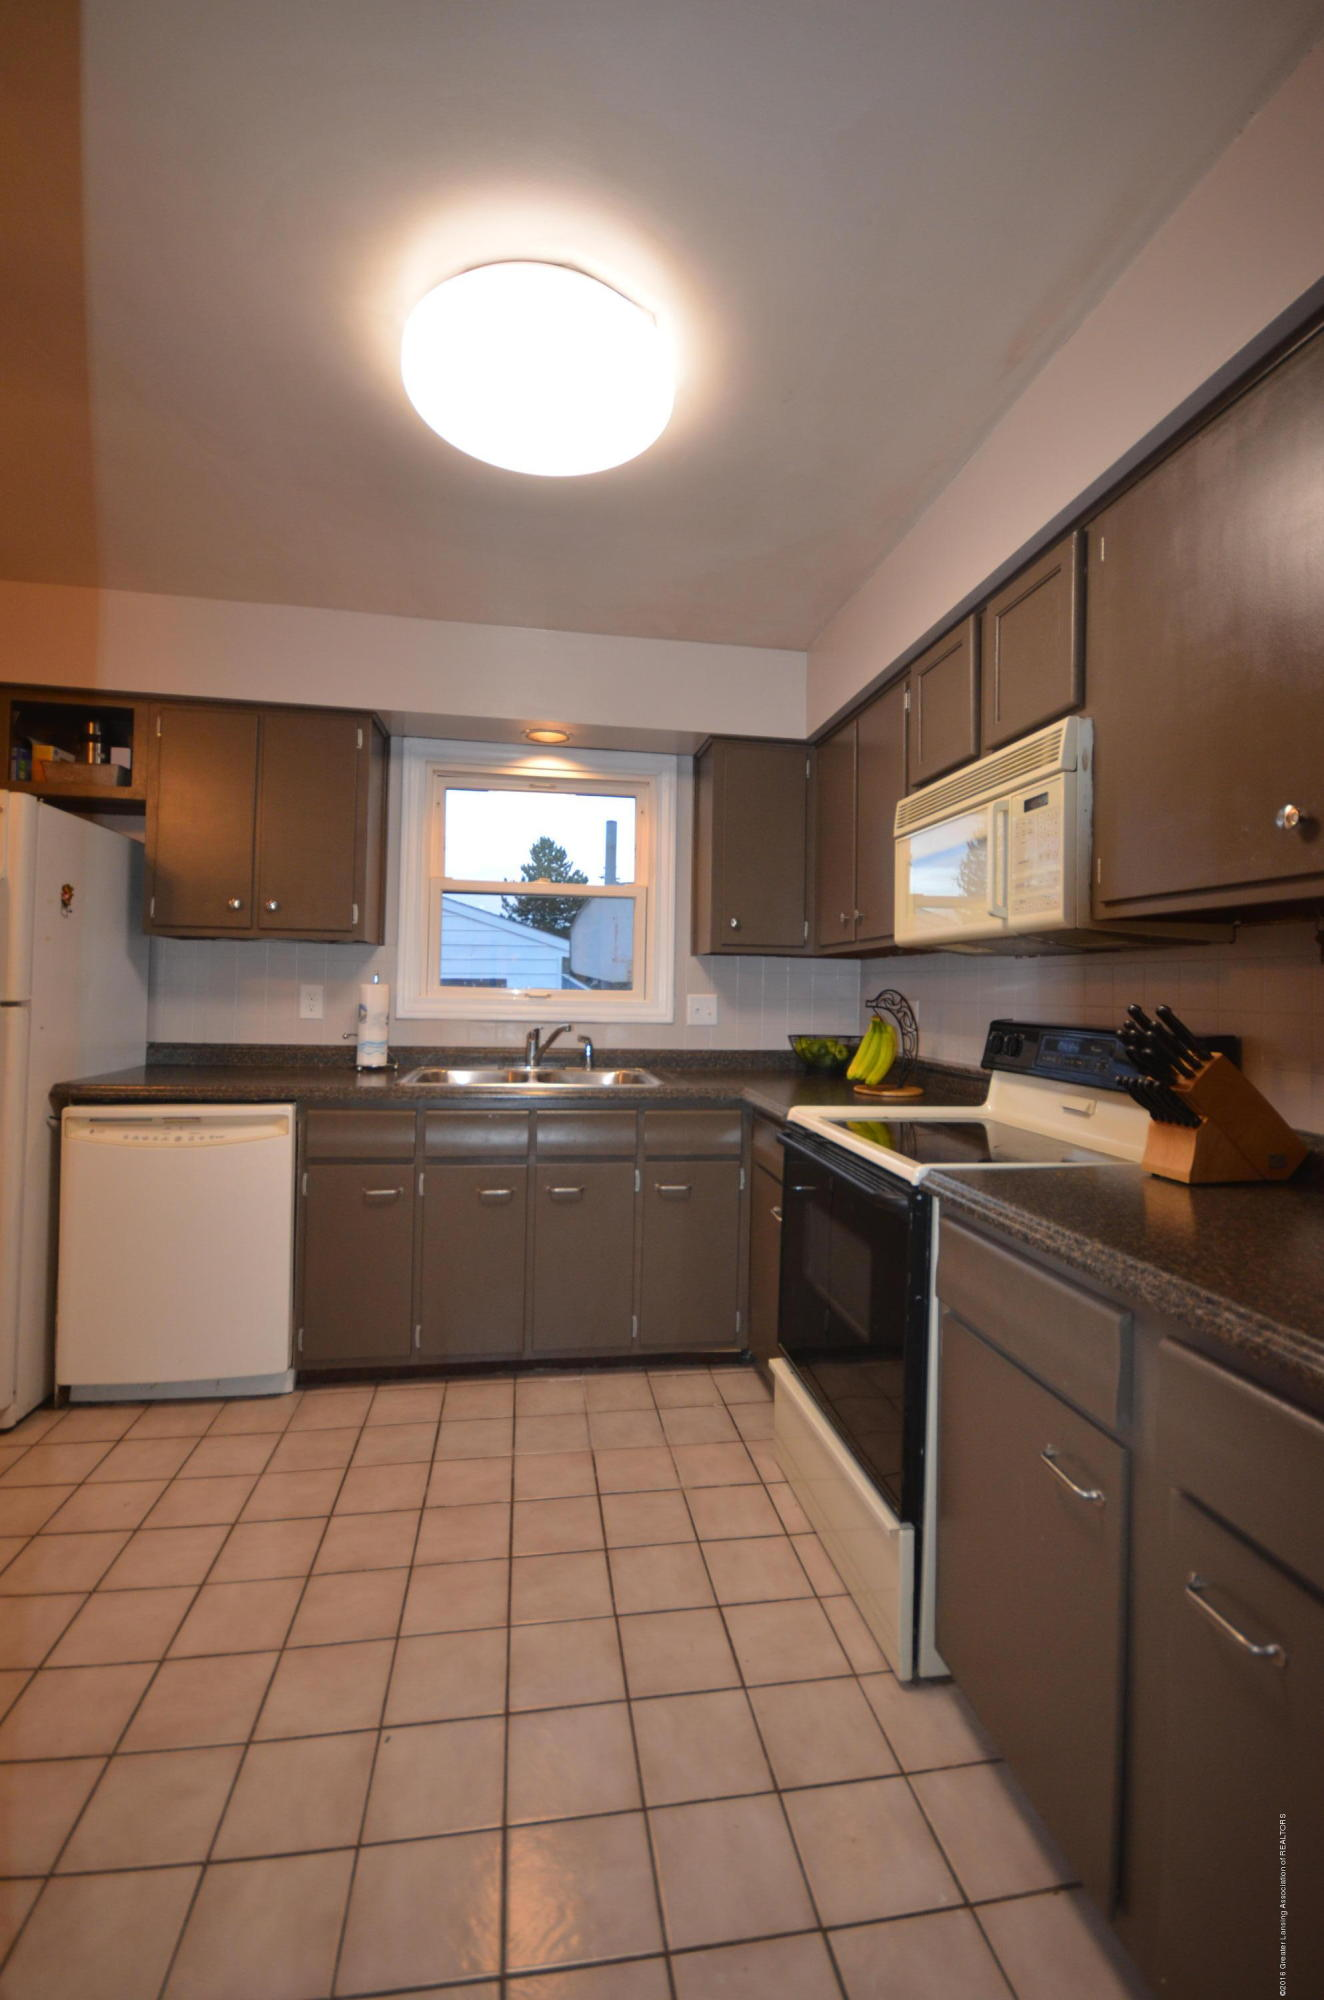 313 S Dibble Blvd - Kitchen - 11